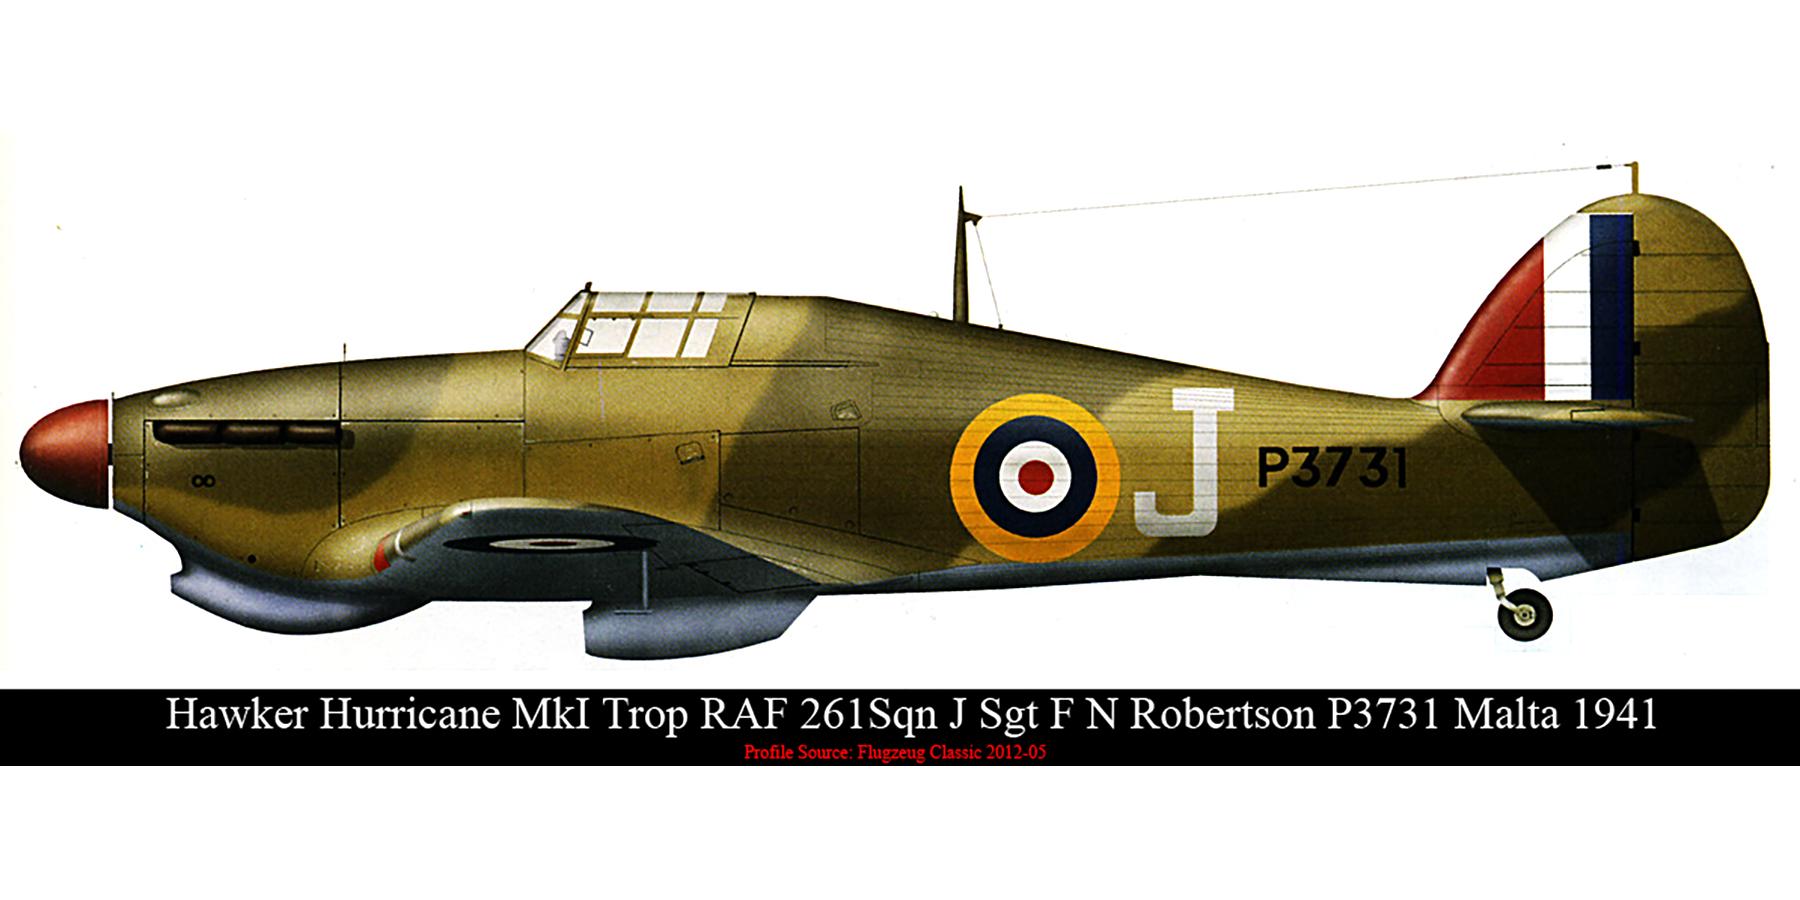 Hawker Hurricane I Trop RAF 261Sqn J Sgt F N Robertson P3731 Malta 1941 0A